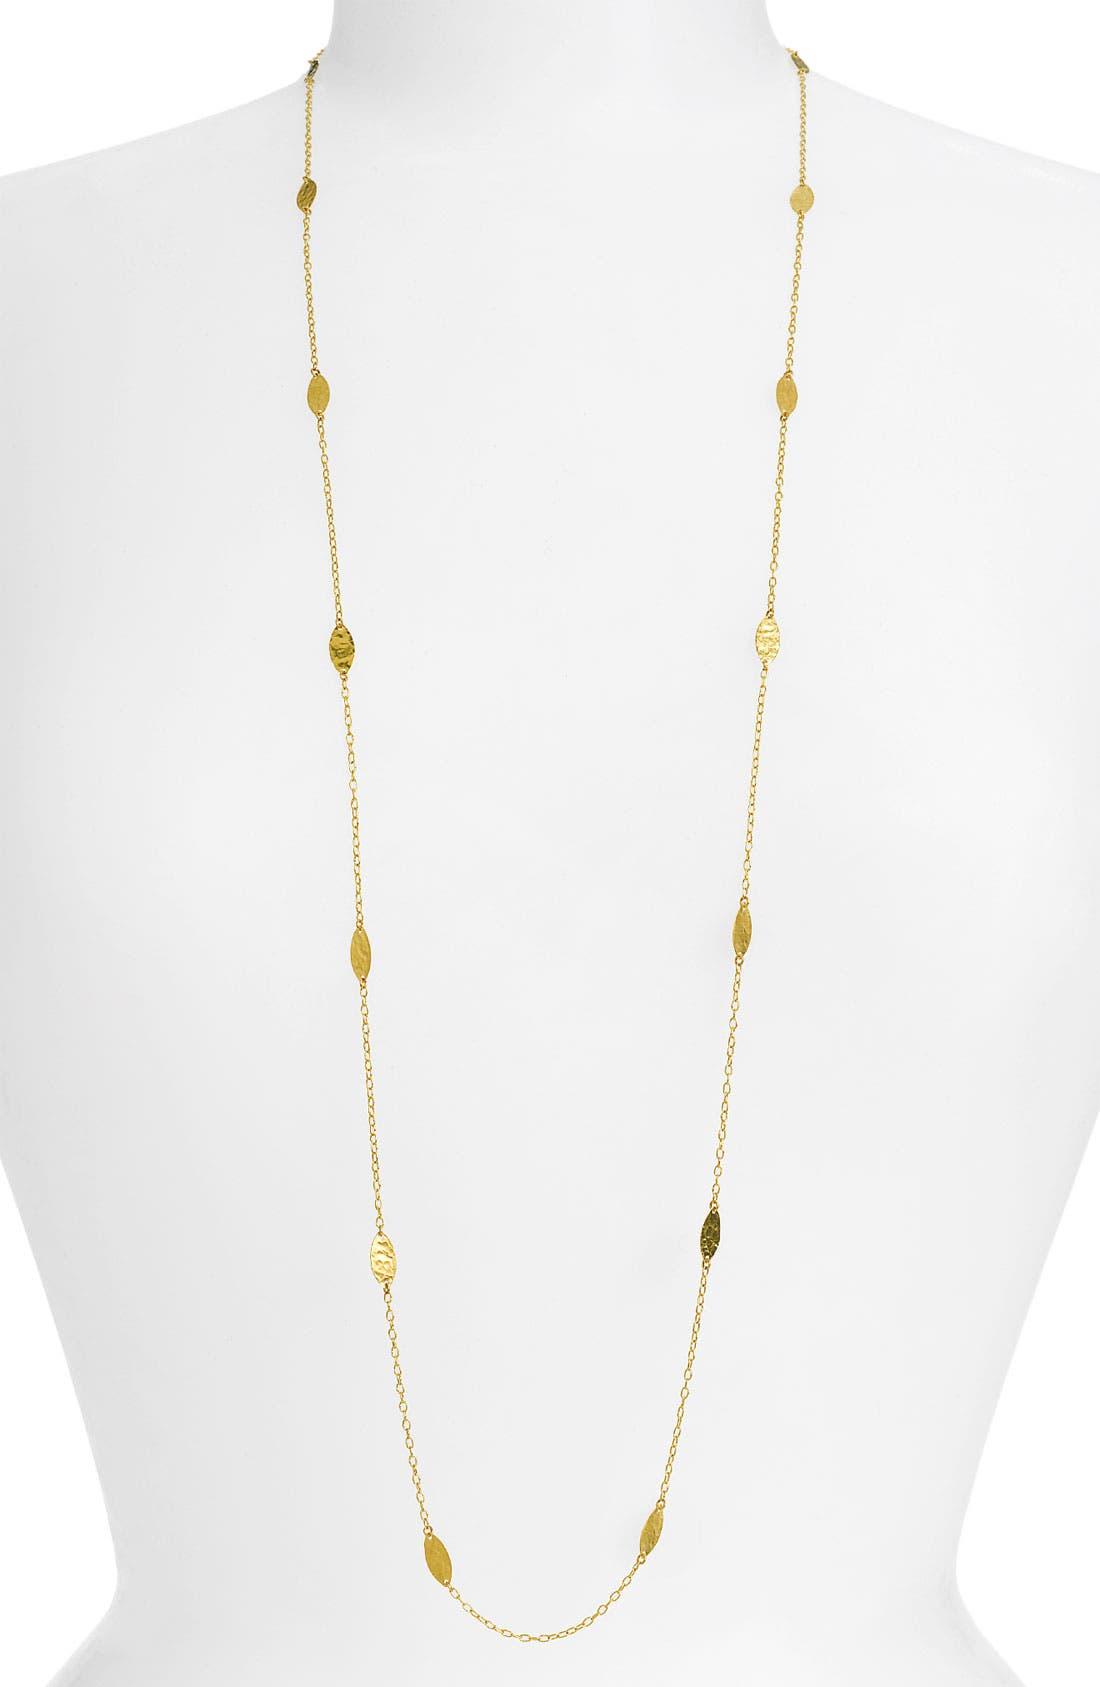 Alternate Image 1 Selected - Gurhan 'Willow' Long Leaf Necklace